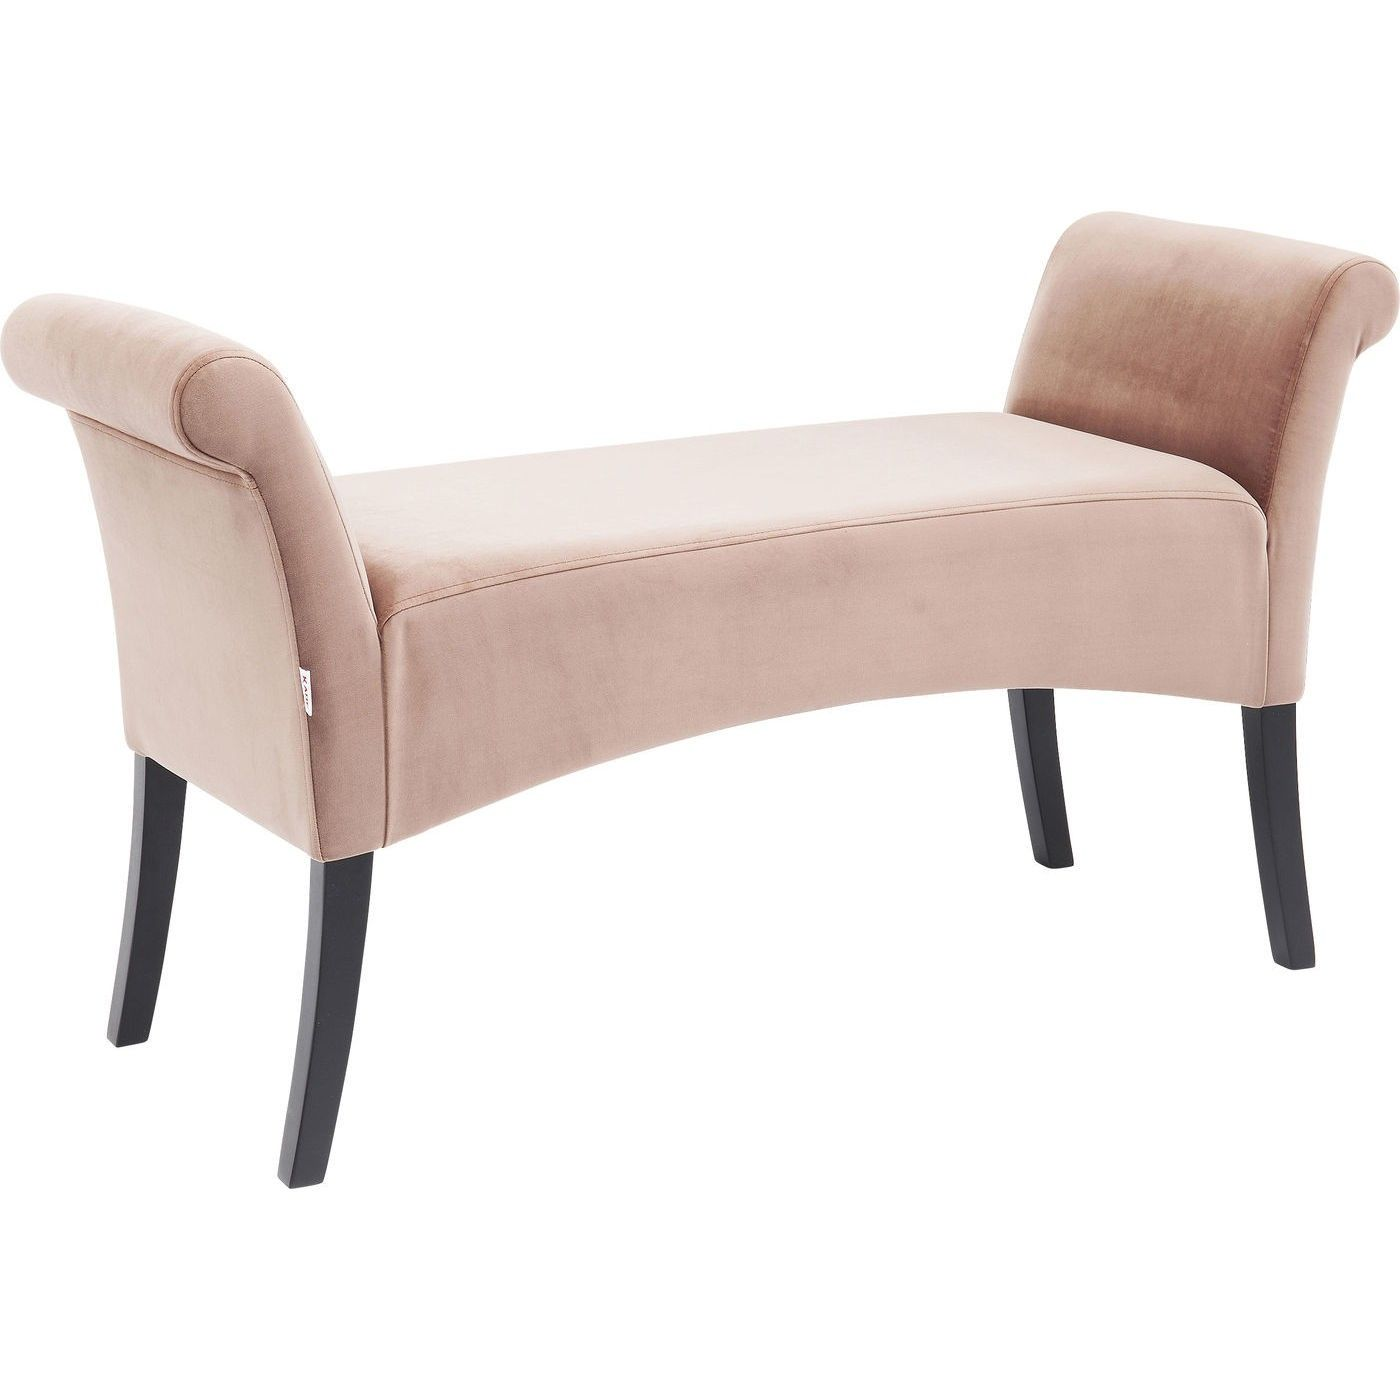 Stuhl Mit Armlehne Radar Bubble Weiss Interieur Pinterest Chair